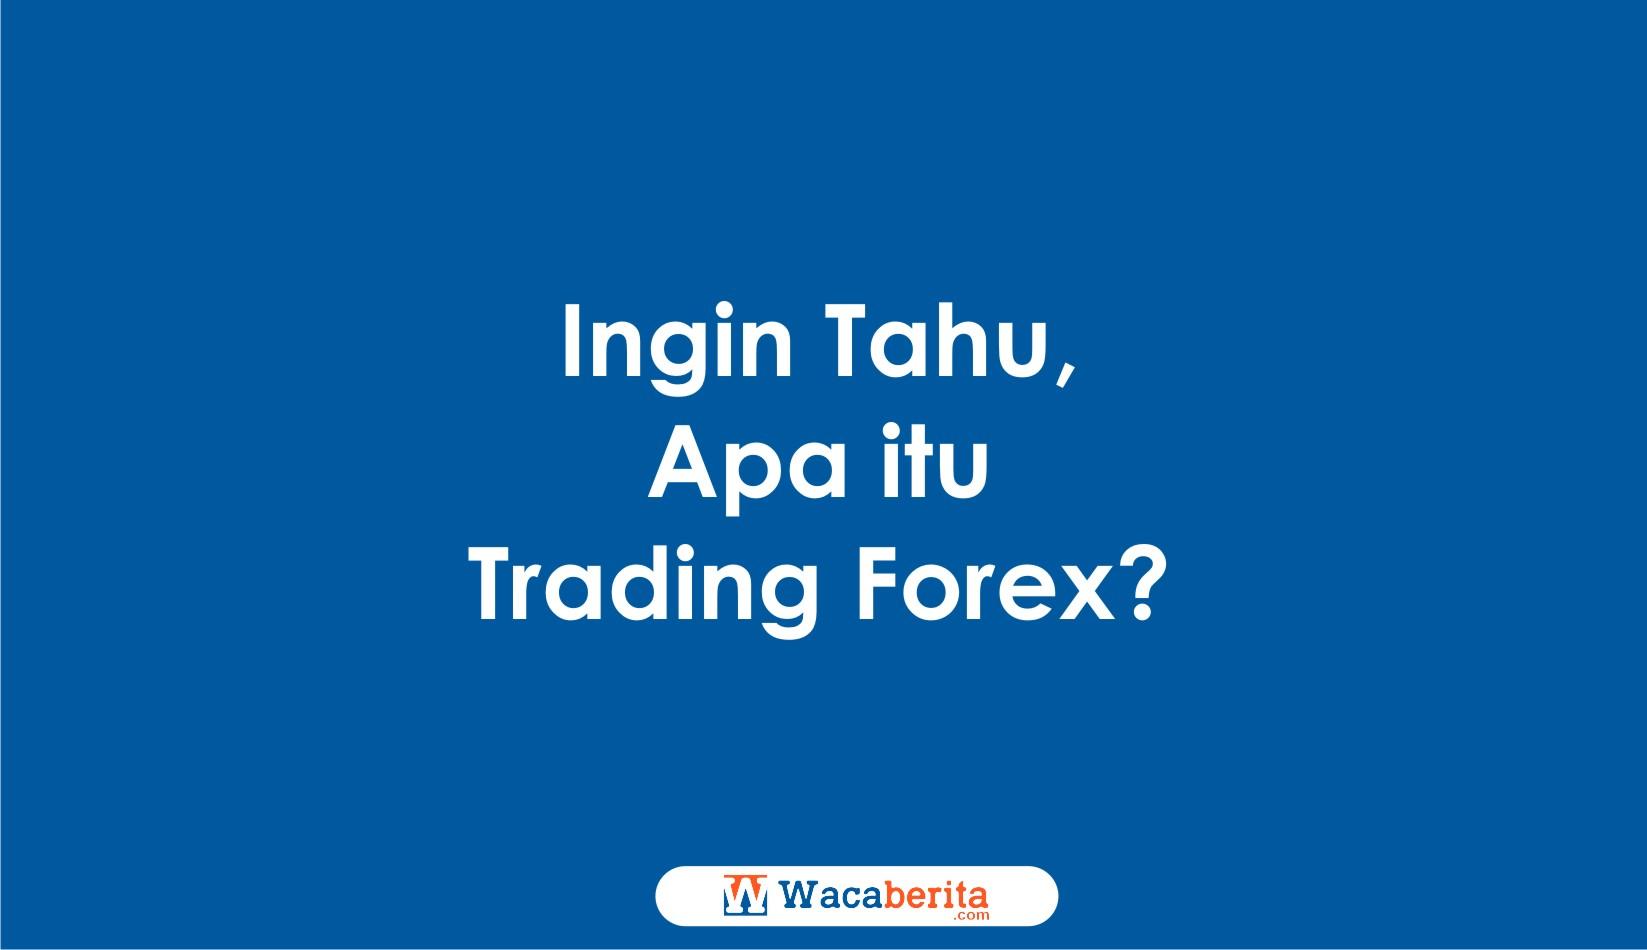 Ingin Tahu, Apa itu Trading Forex?